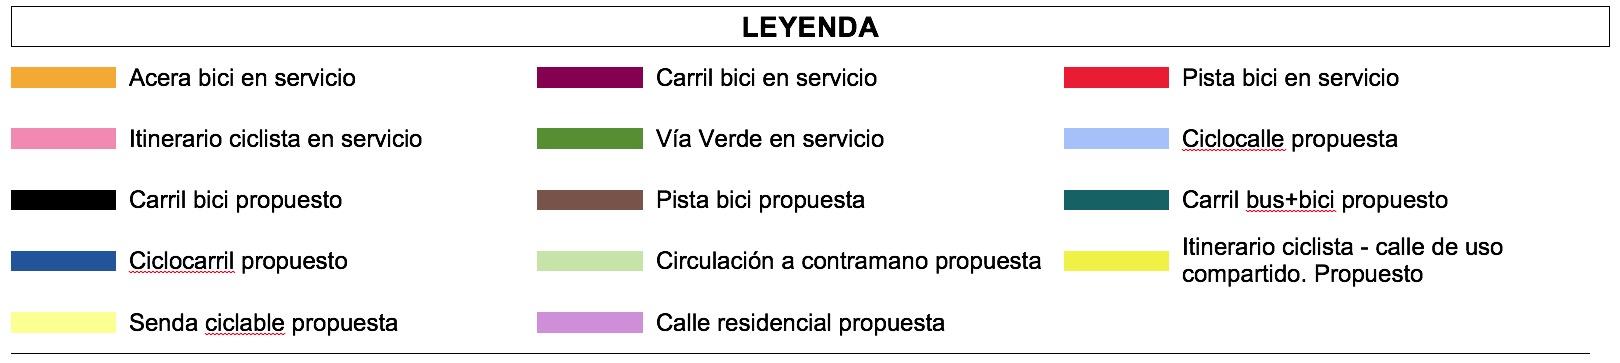 Leyenda mapa ciclabilidad